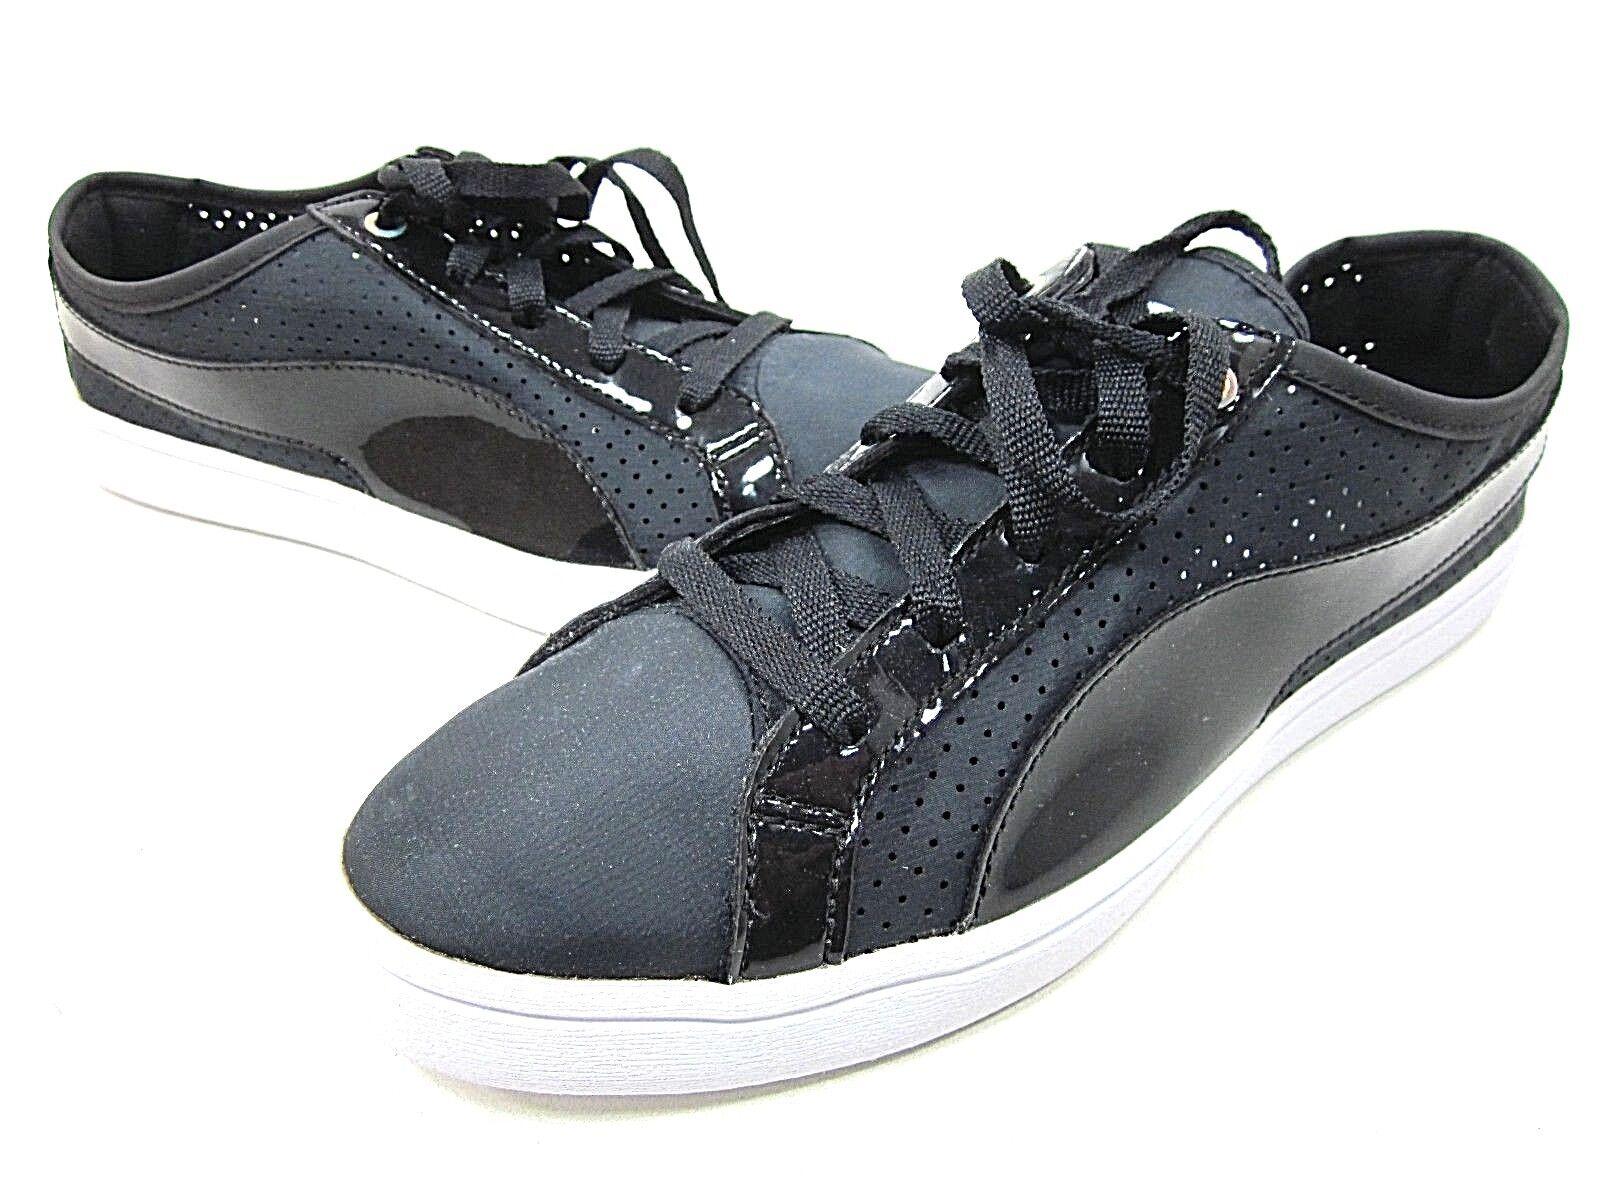 PUMA, KAI LO PERFORATED SHOE, WOMEN'S, BLACK, US 7.5M, NEW WITHOUT ORIGINAL BOX Cheap women's shoes women's shoes